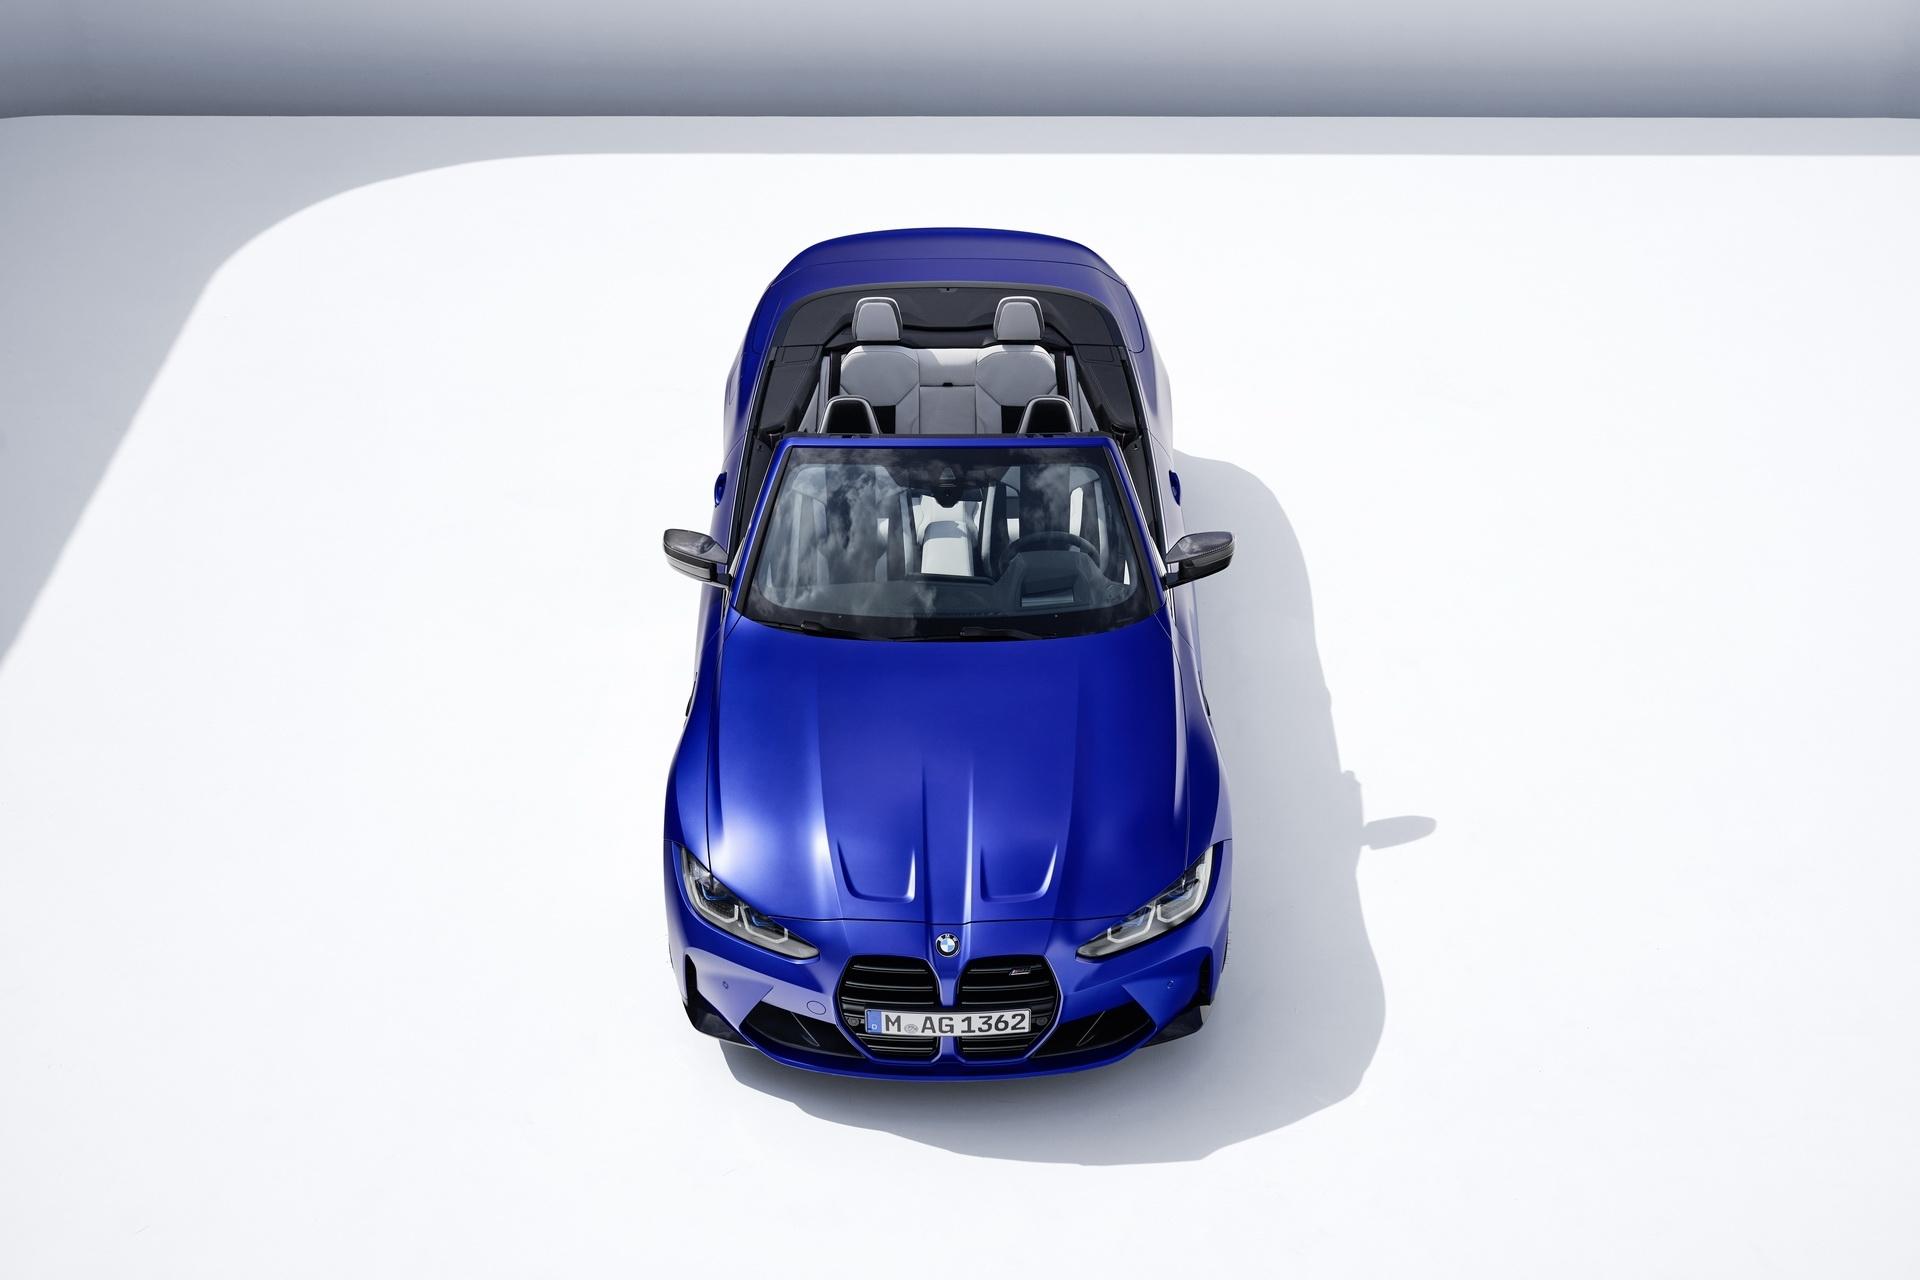 Bmw M4 Competition Cabrio 2021 0521 004